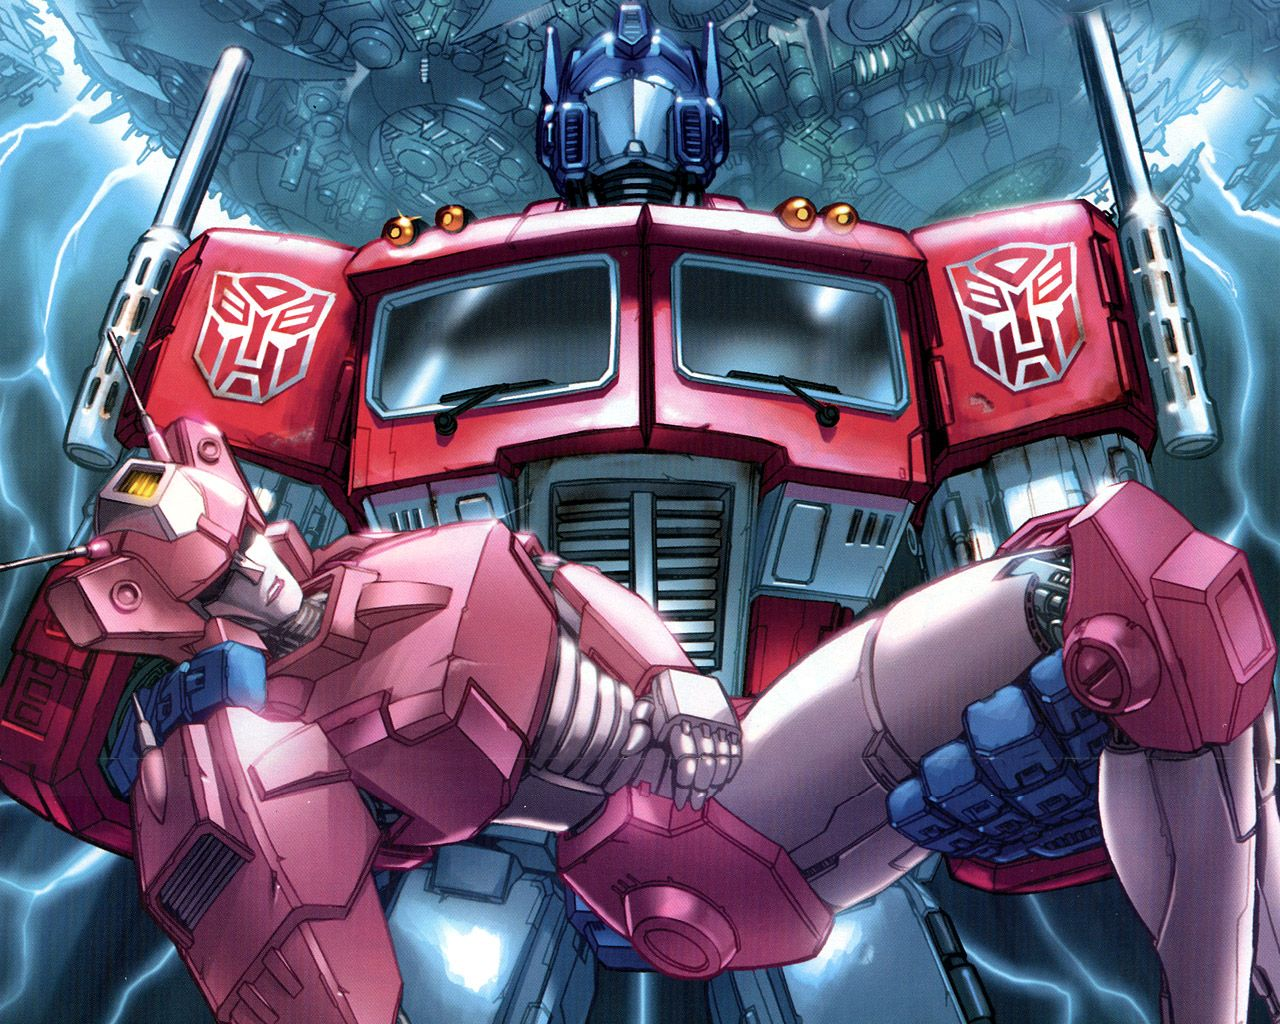 Comics Transformers Wallpaper Background 1280 X 1024 Id 16752 Wallpaper Abyss Transformers Canvas Transformers Transformers Autobots